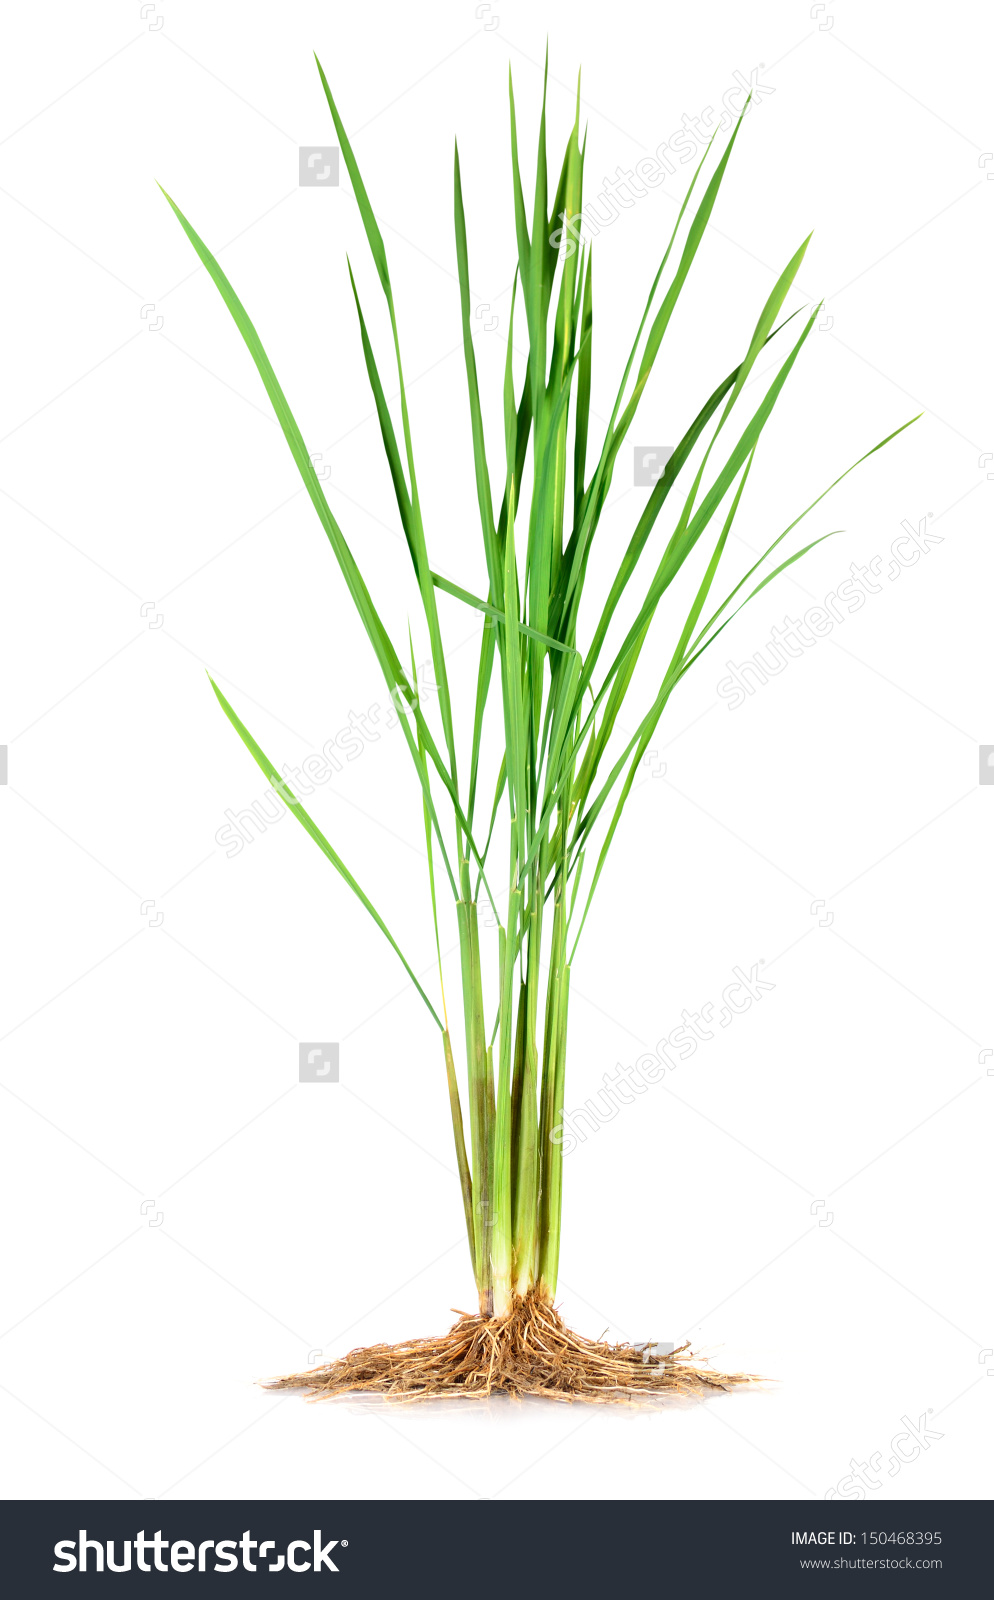 Anatomy Monocotyledonjasmine Rice Plant Stock Photo 150468395.